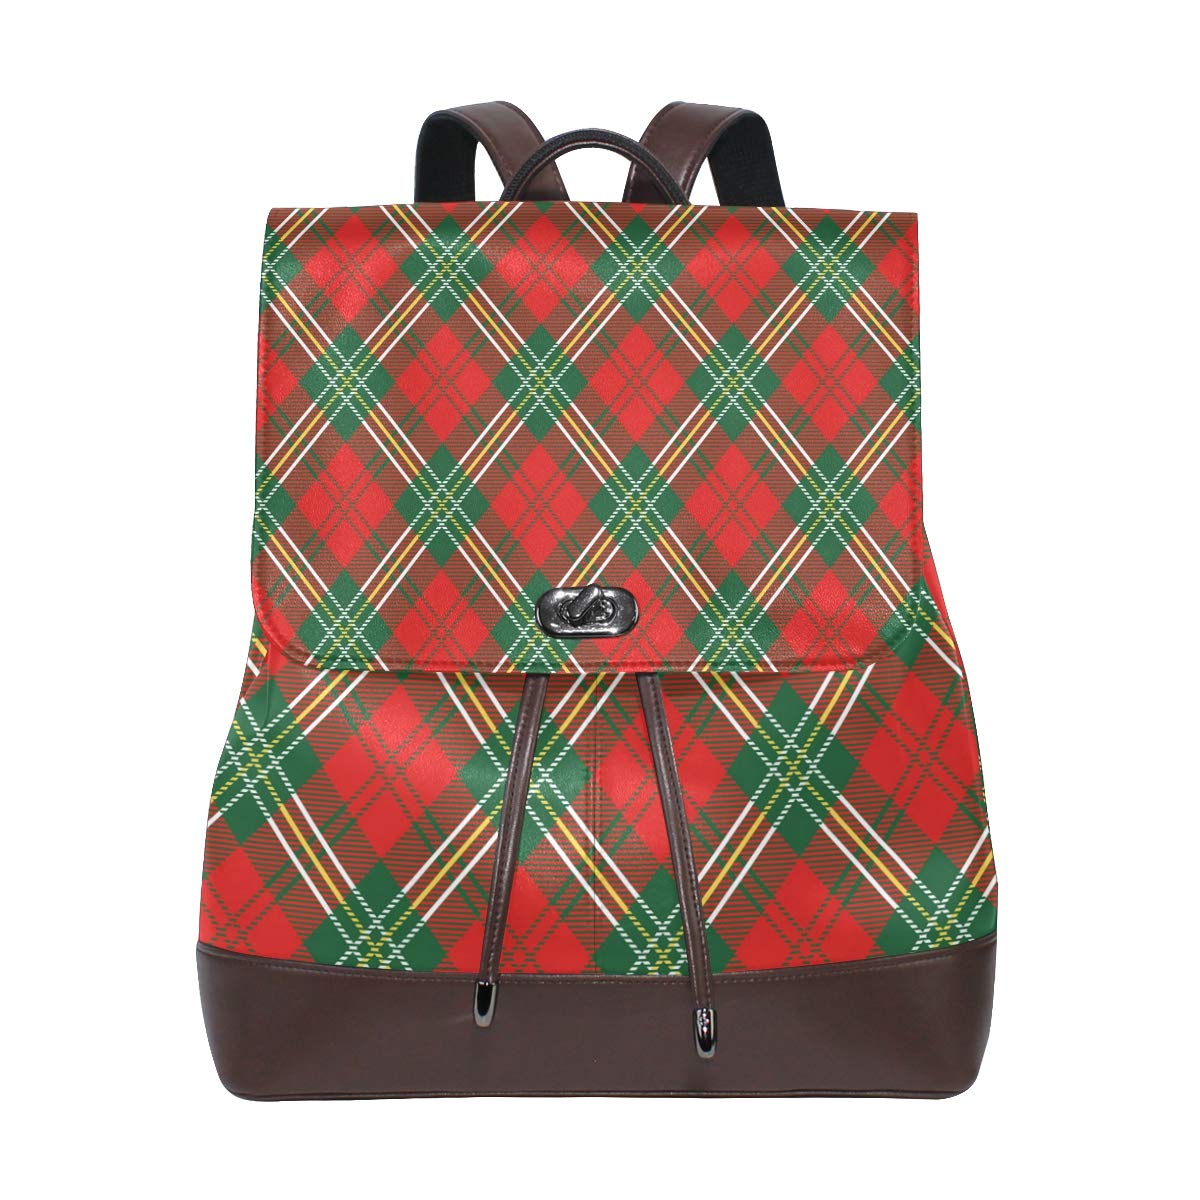 KEAKIA Women PU Leather Red Plaid Backpack Purse Travel School Shoulder Bag Casual Daypack